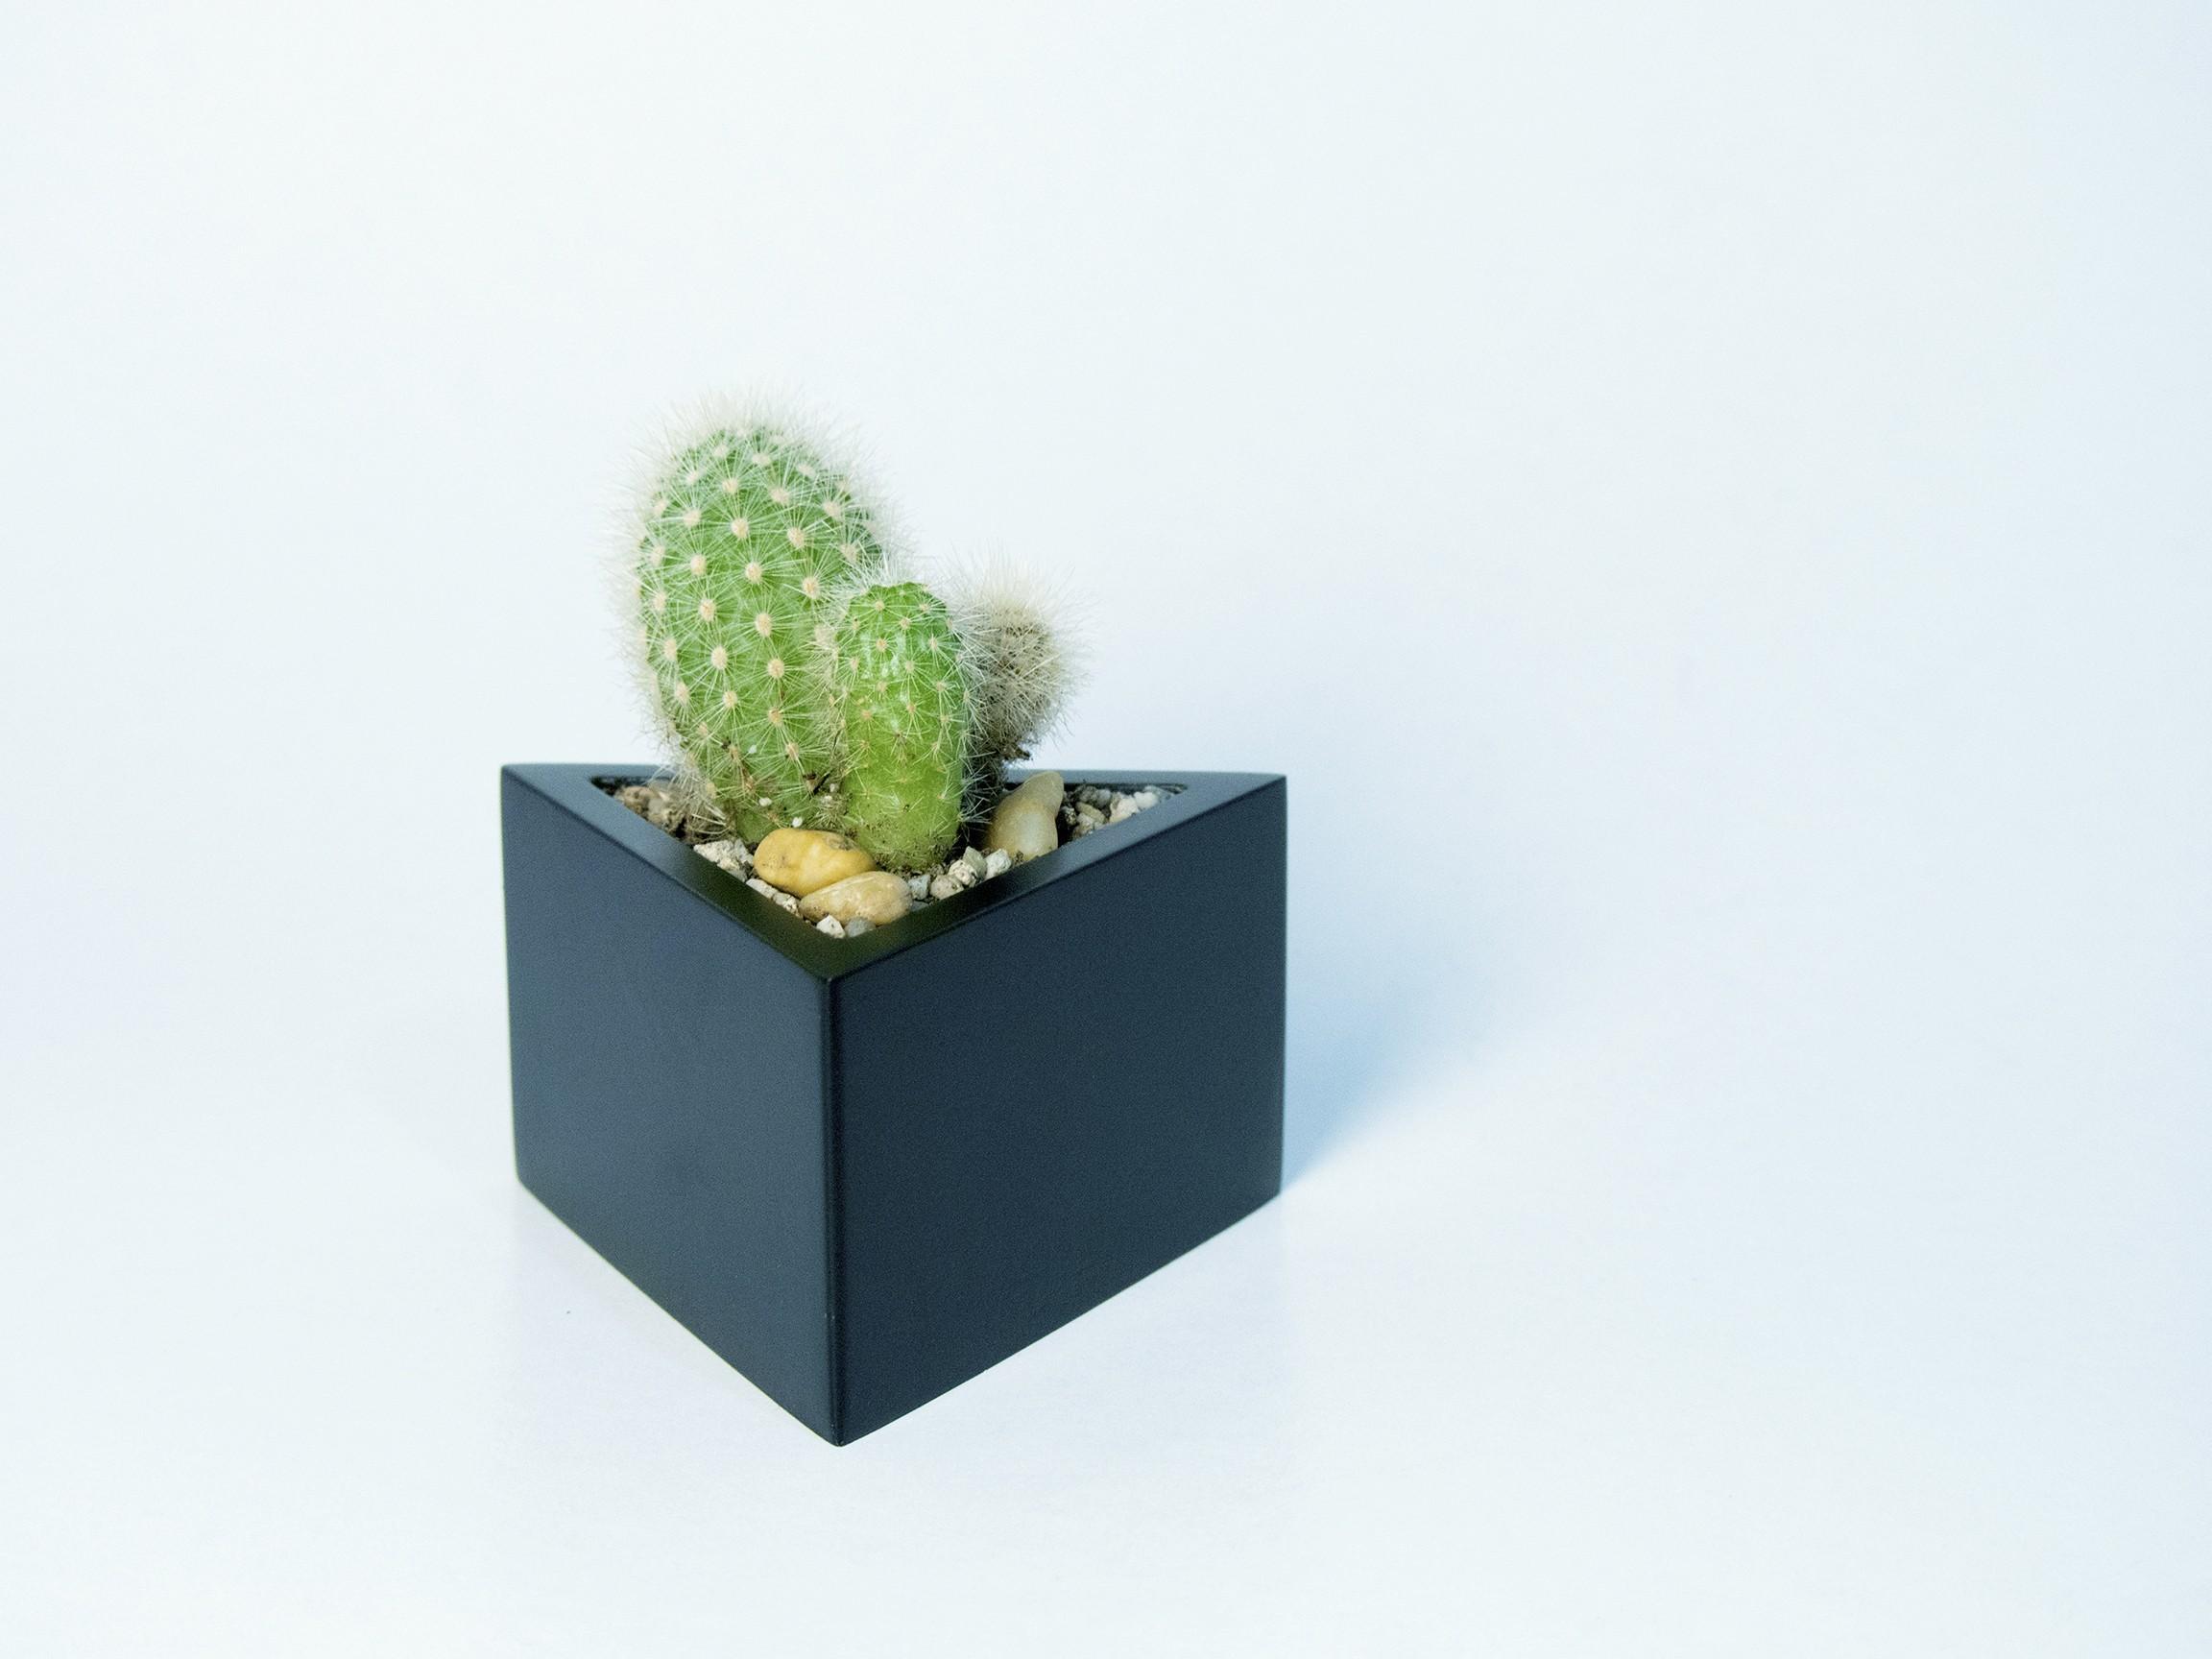 P2140278.jpg Download STL file Prisma planter • 3D print template, atelierro